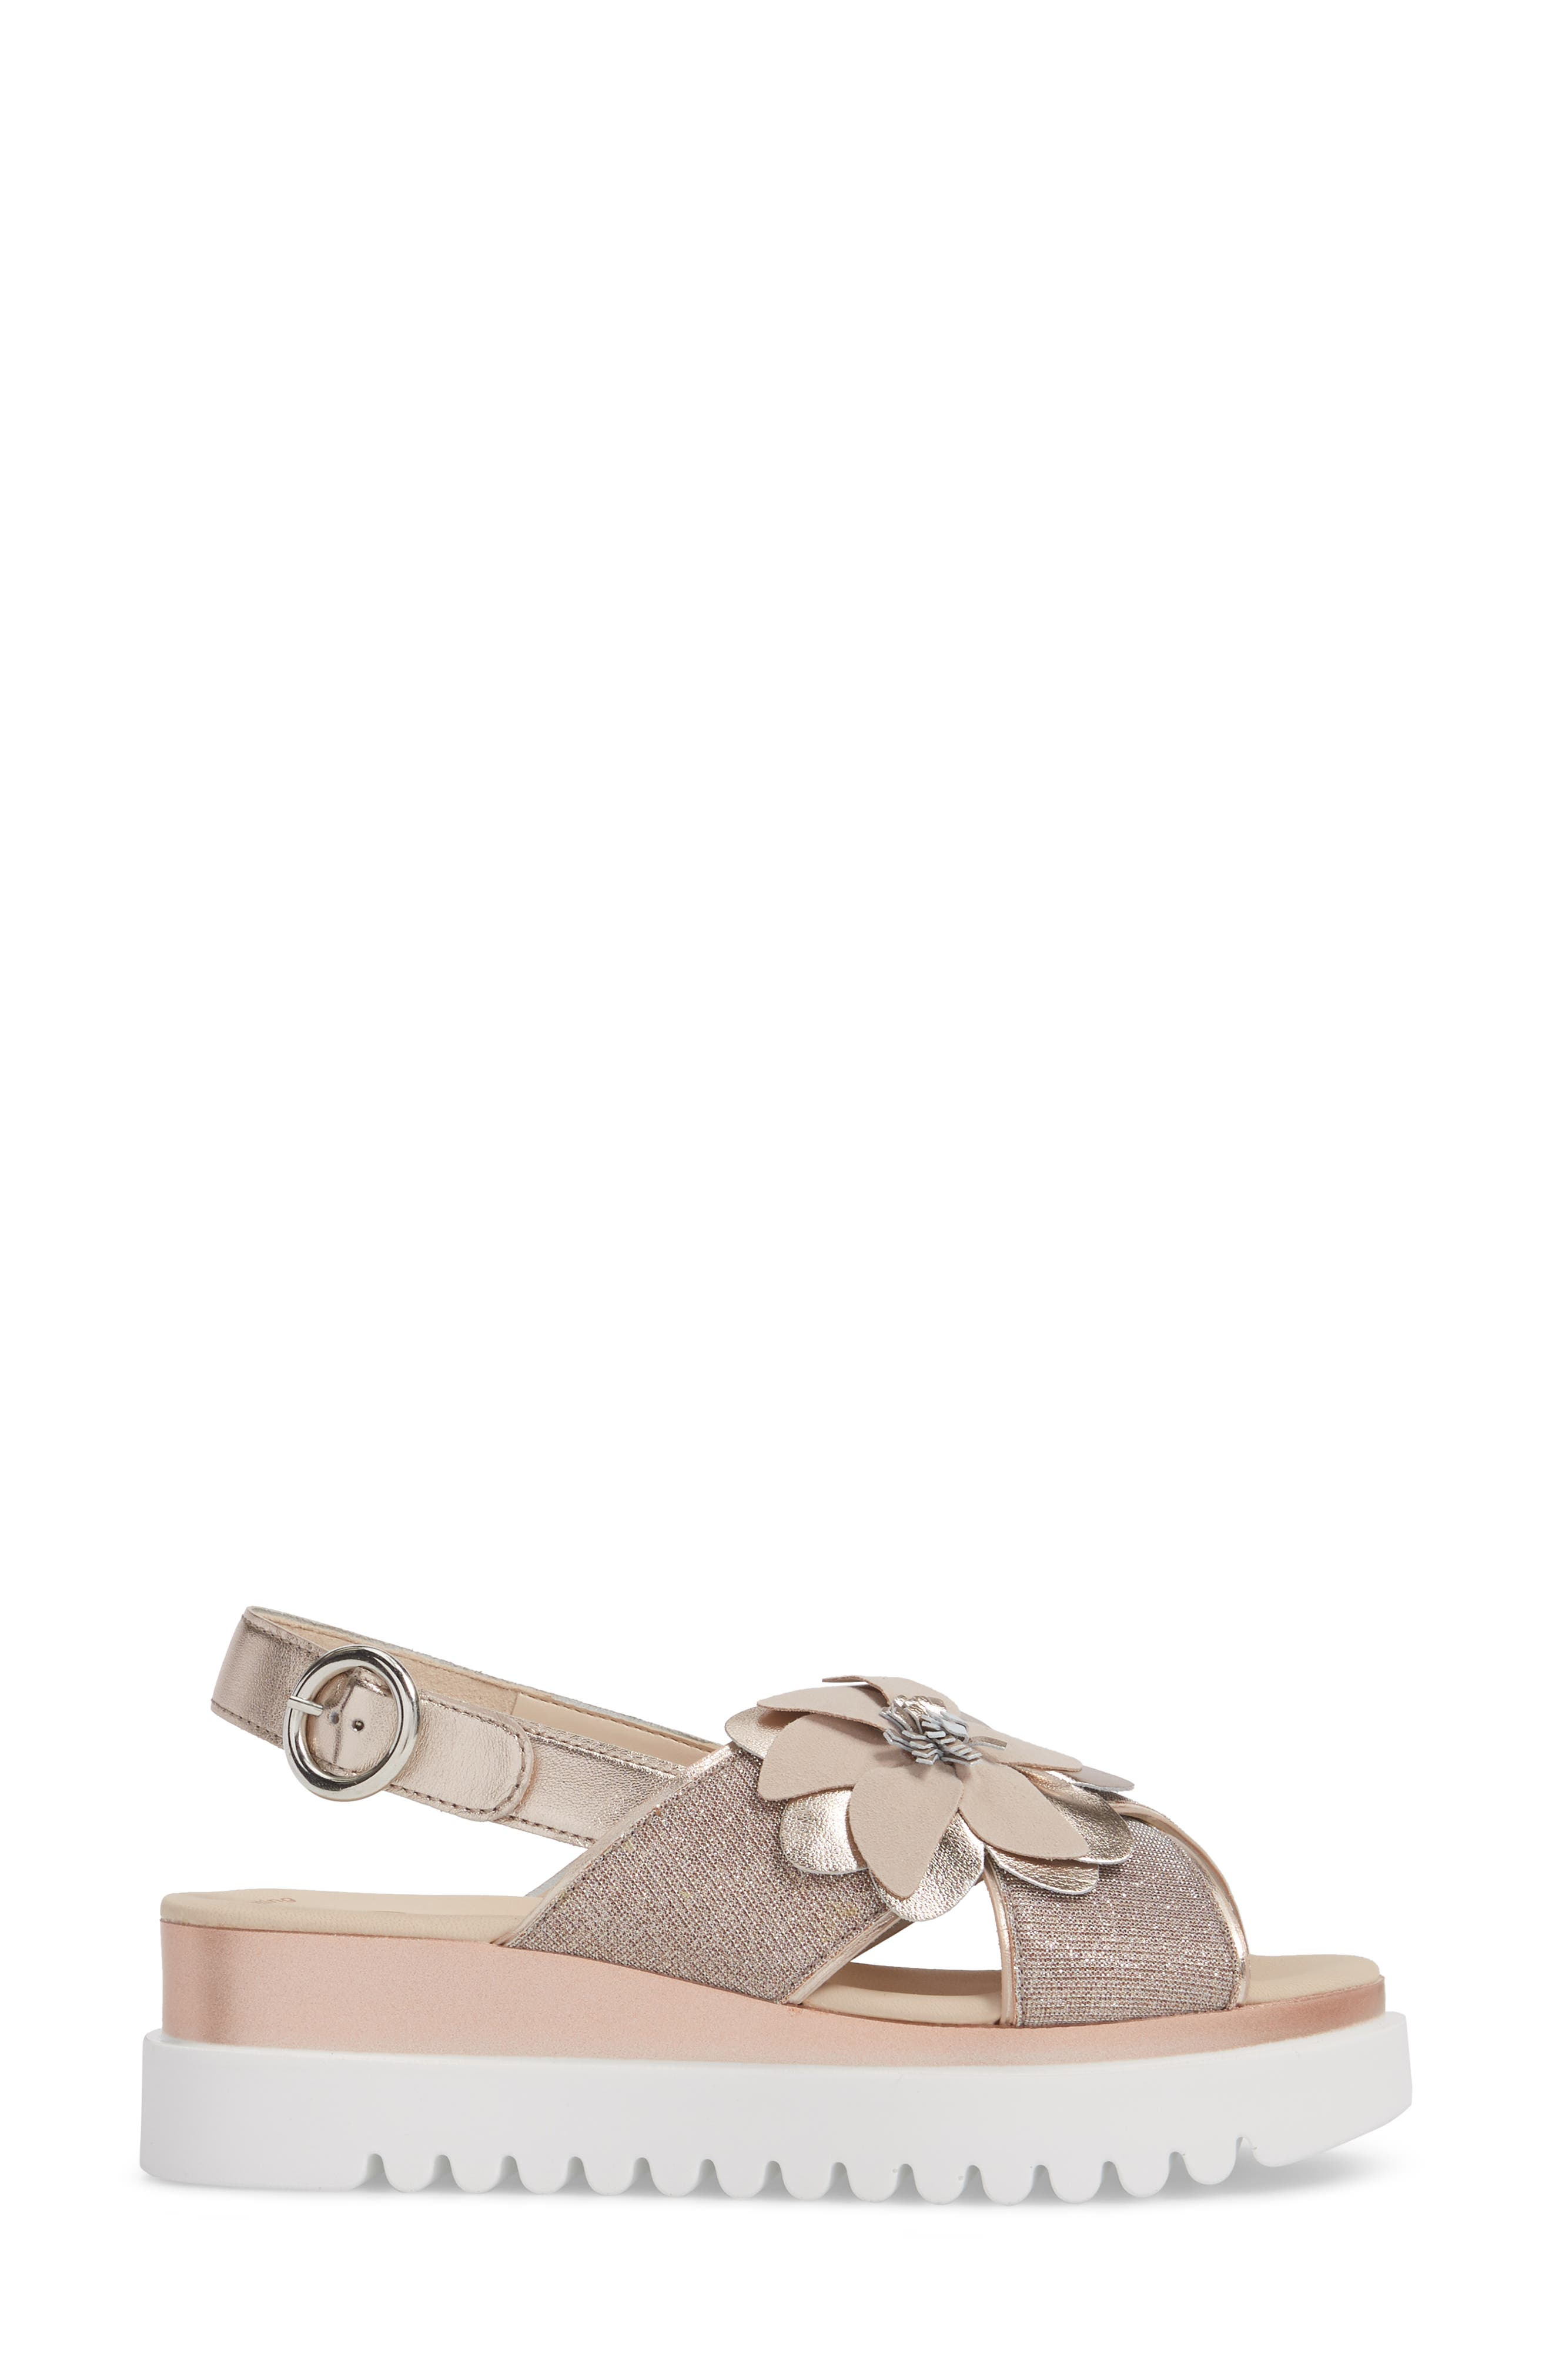 Flower Platform Sandal,                             Alternate thumbnail 3, color,                             Rose Metallic Fabric